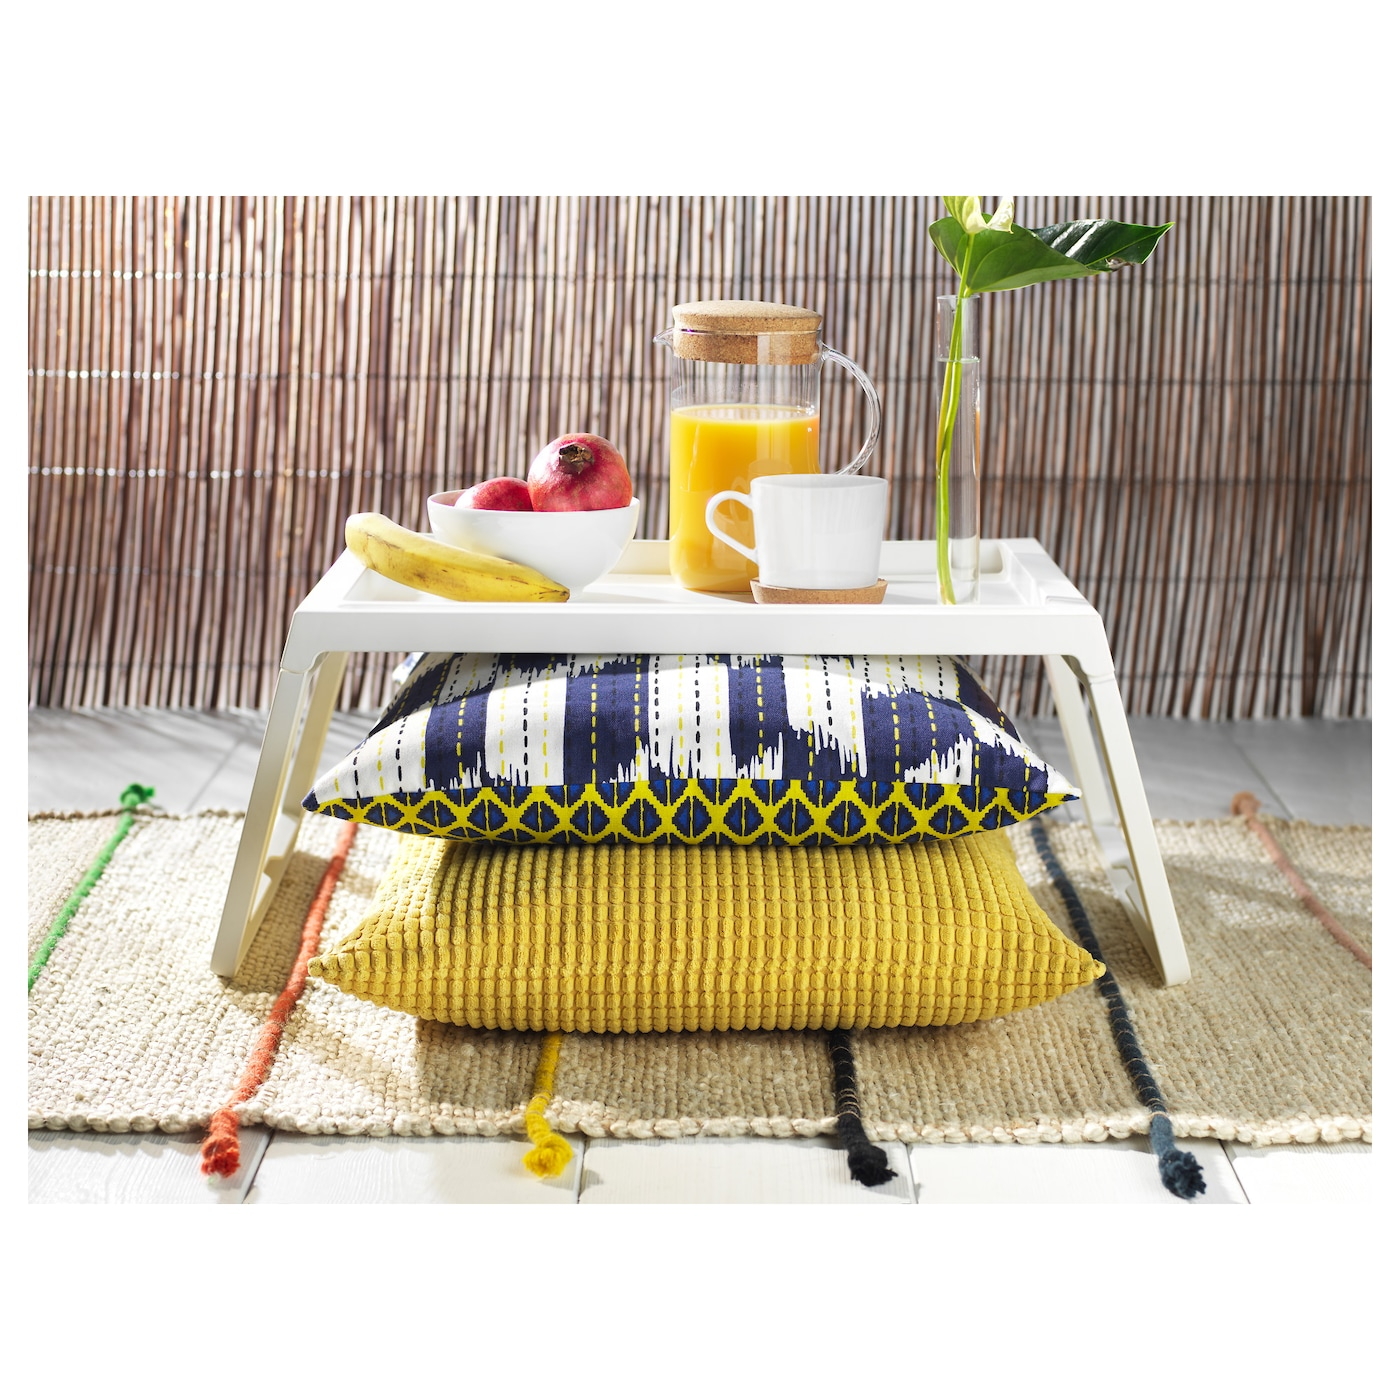 Ikea klipsk bandeja de cama al tener las patas plegables la bandeja ocupa  poco jpg 2000x2000 fc3d045a7072